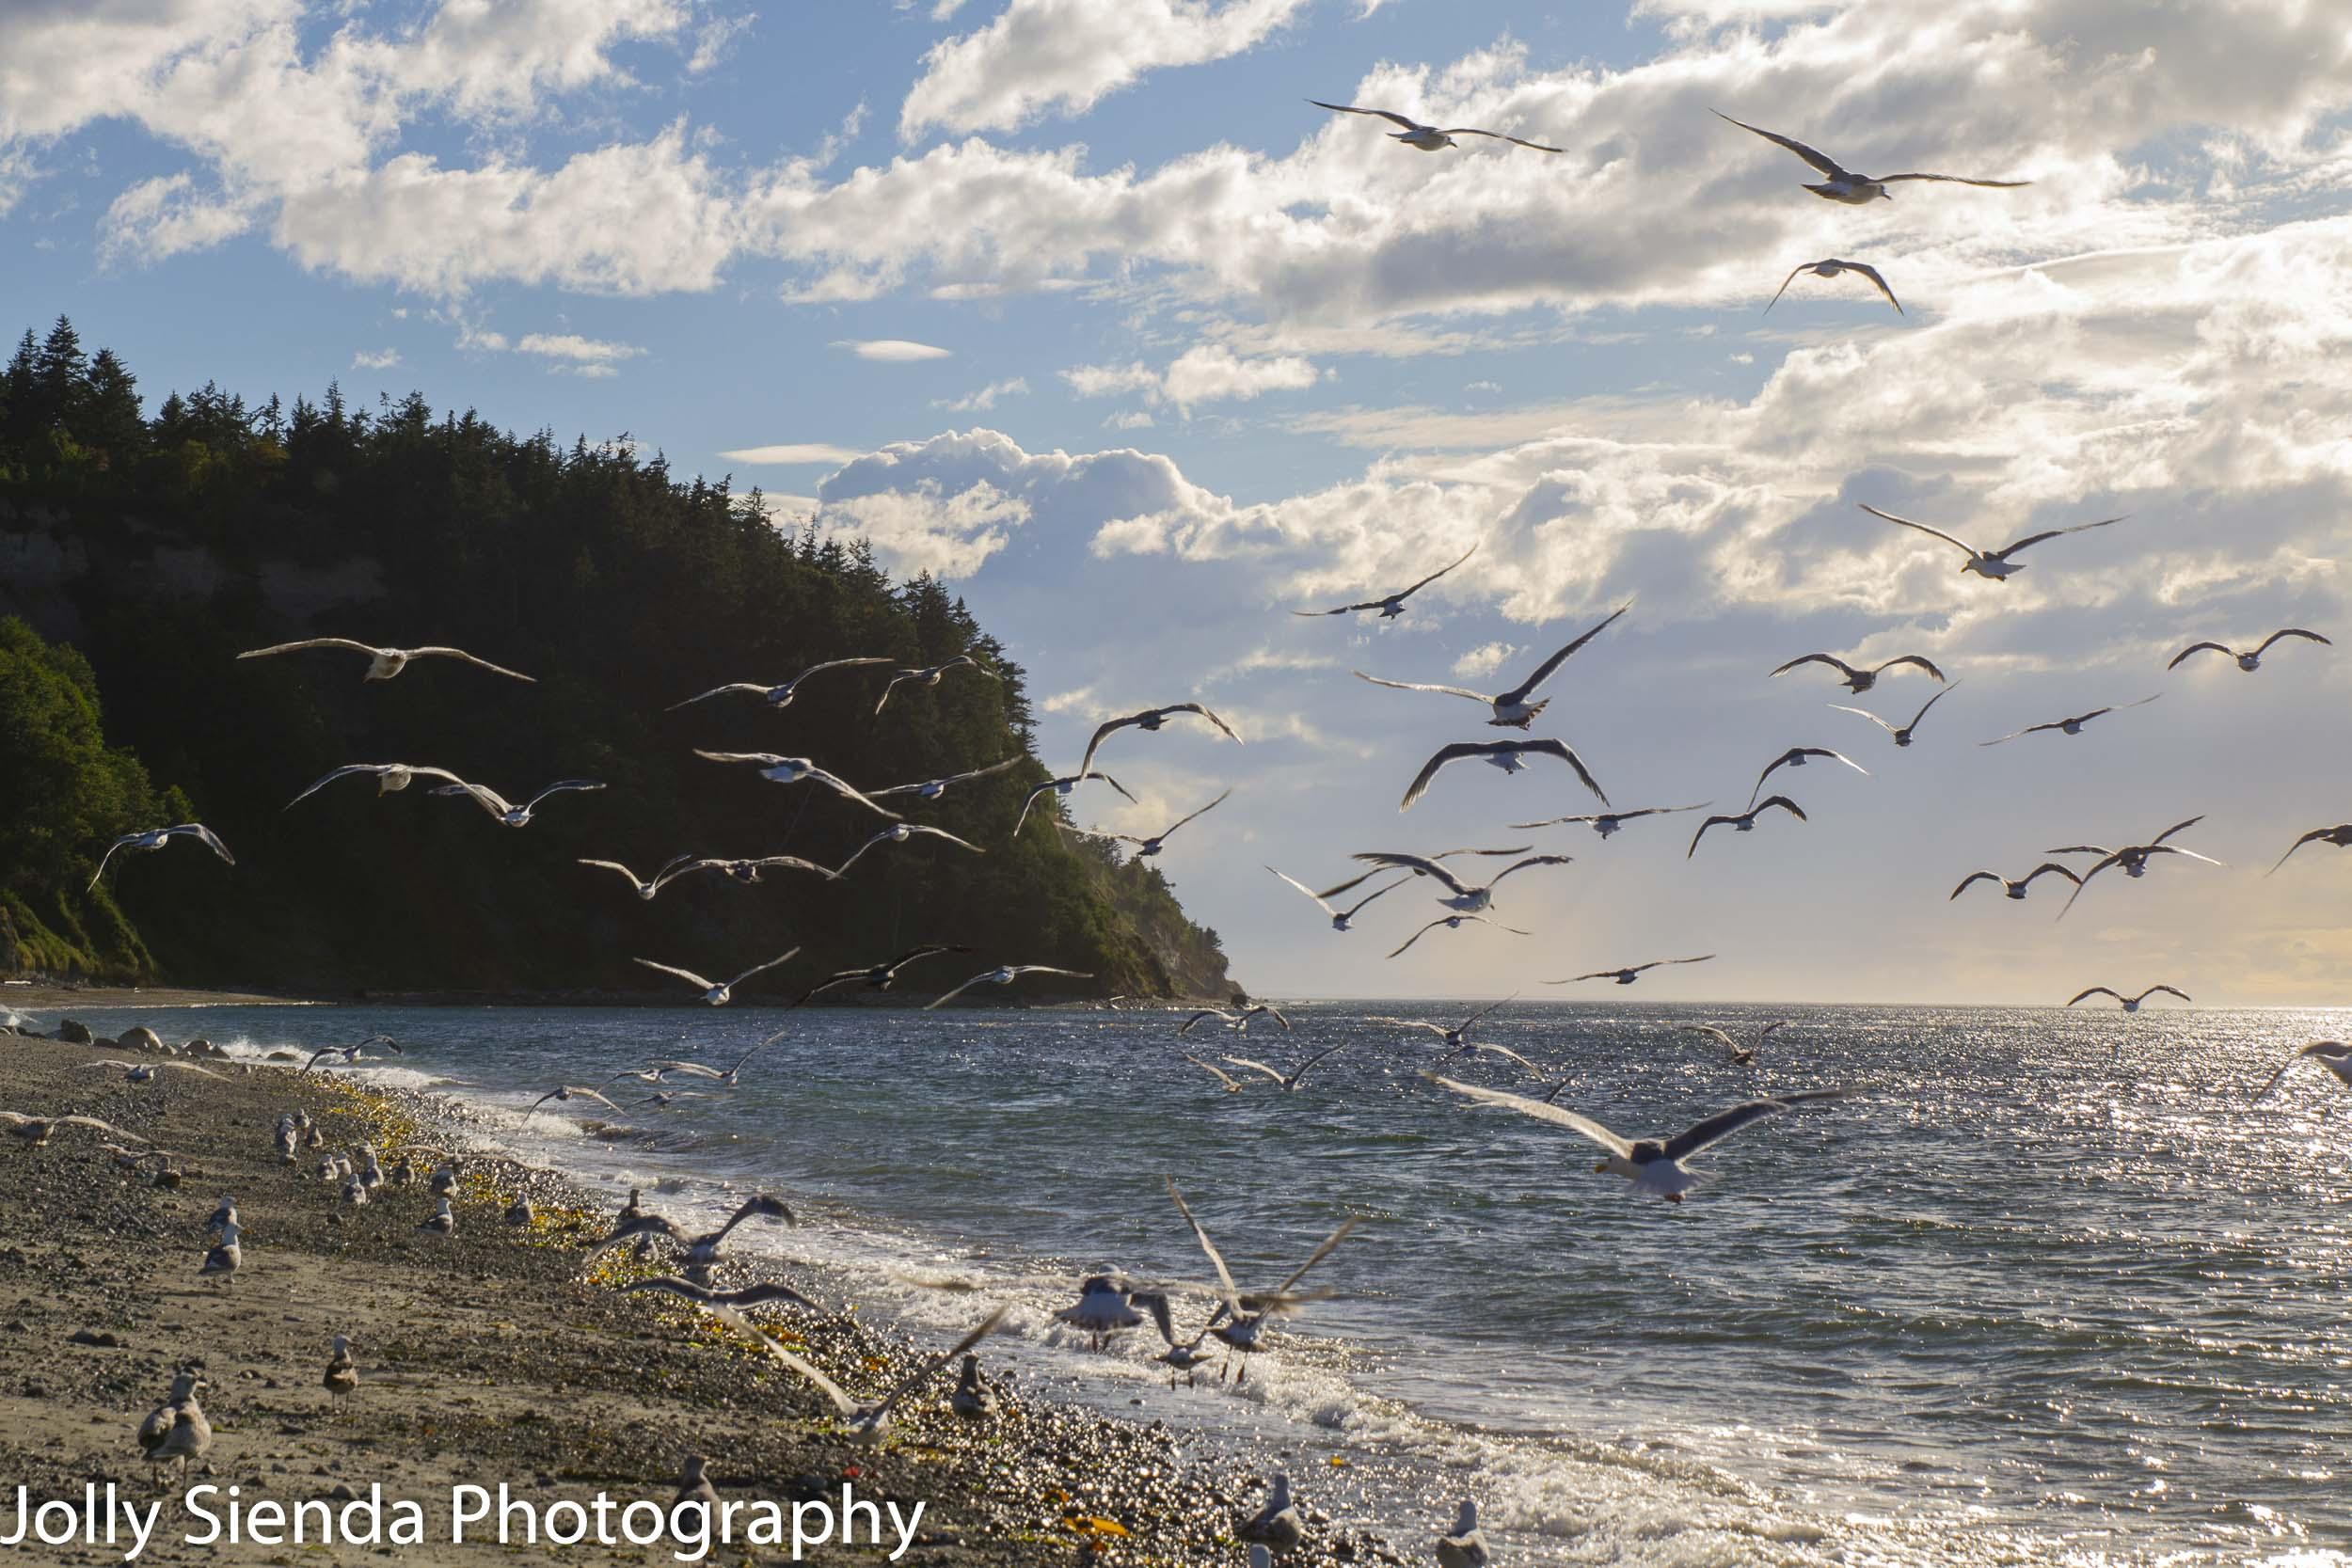 Seagulls along the shore at Fort Worden beach, Fort Worden, Washington.